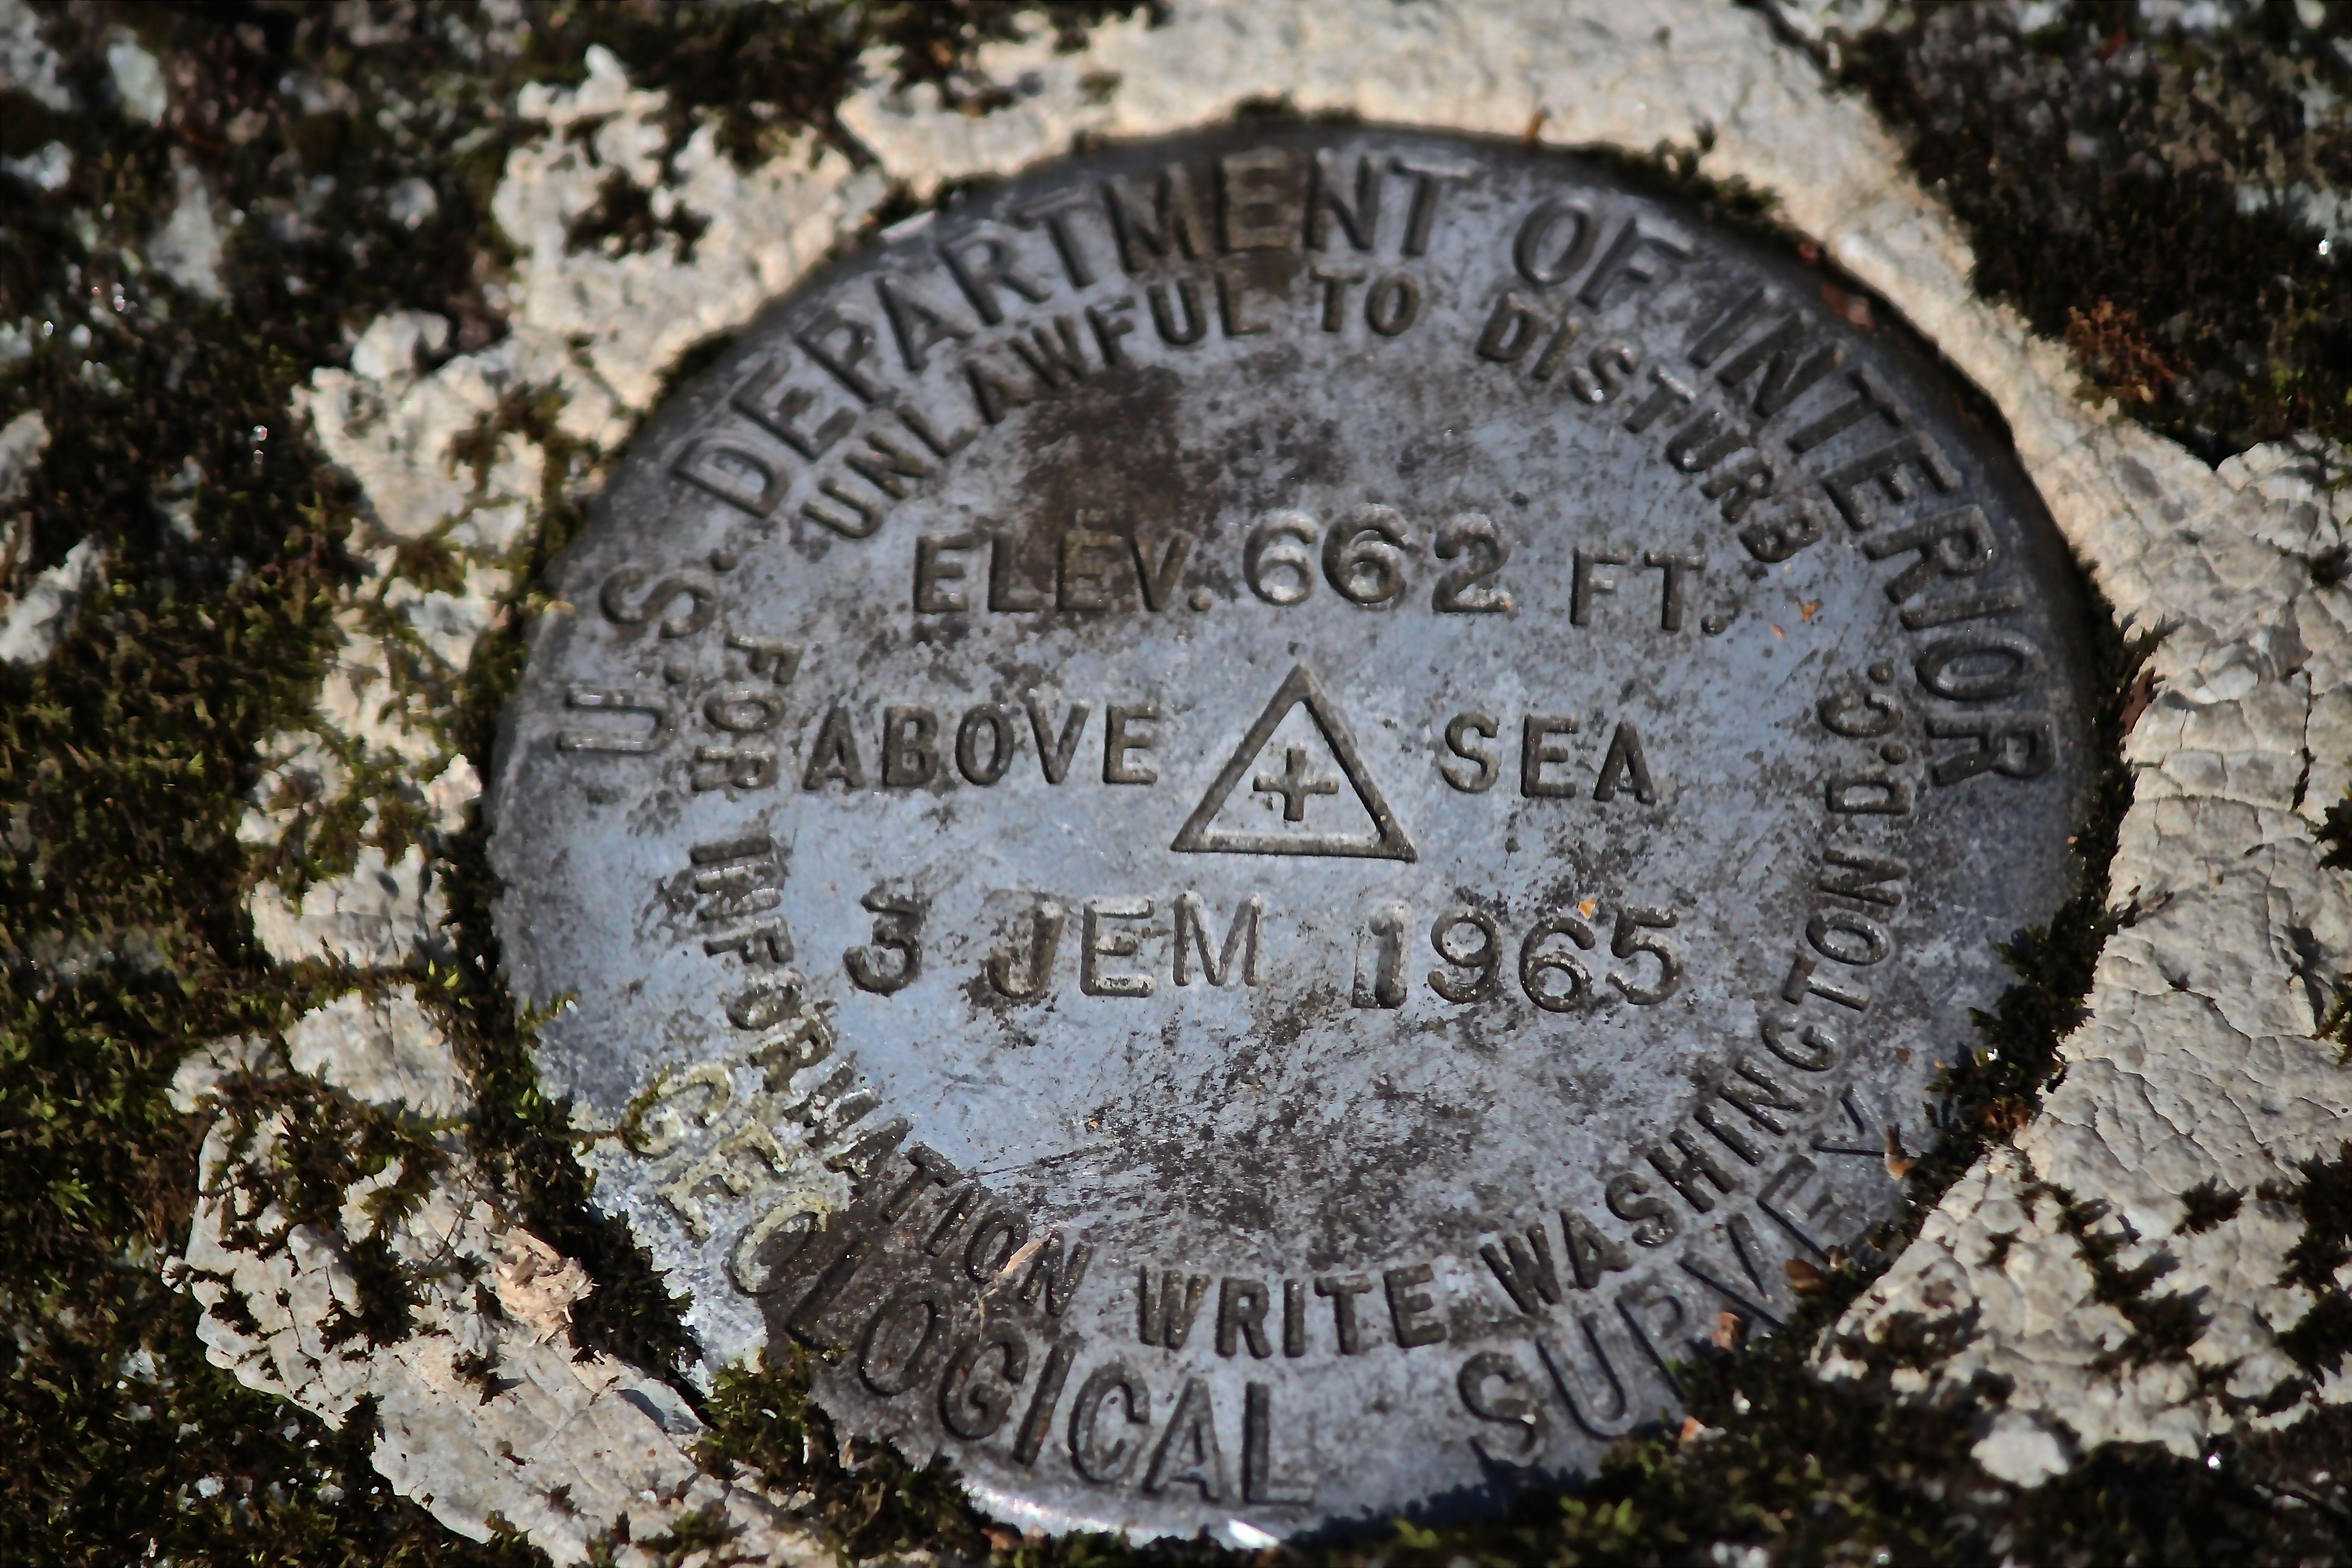 h-survey marker